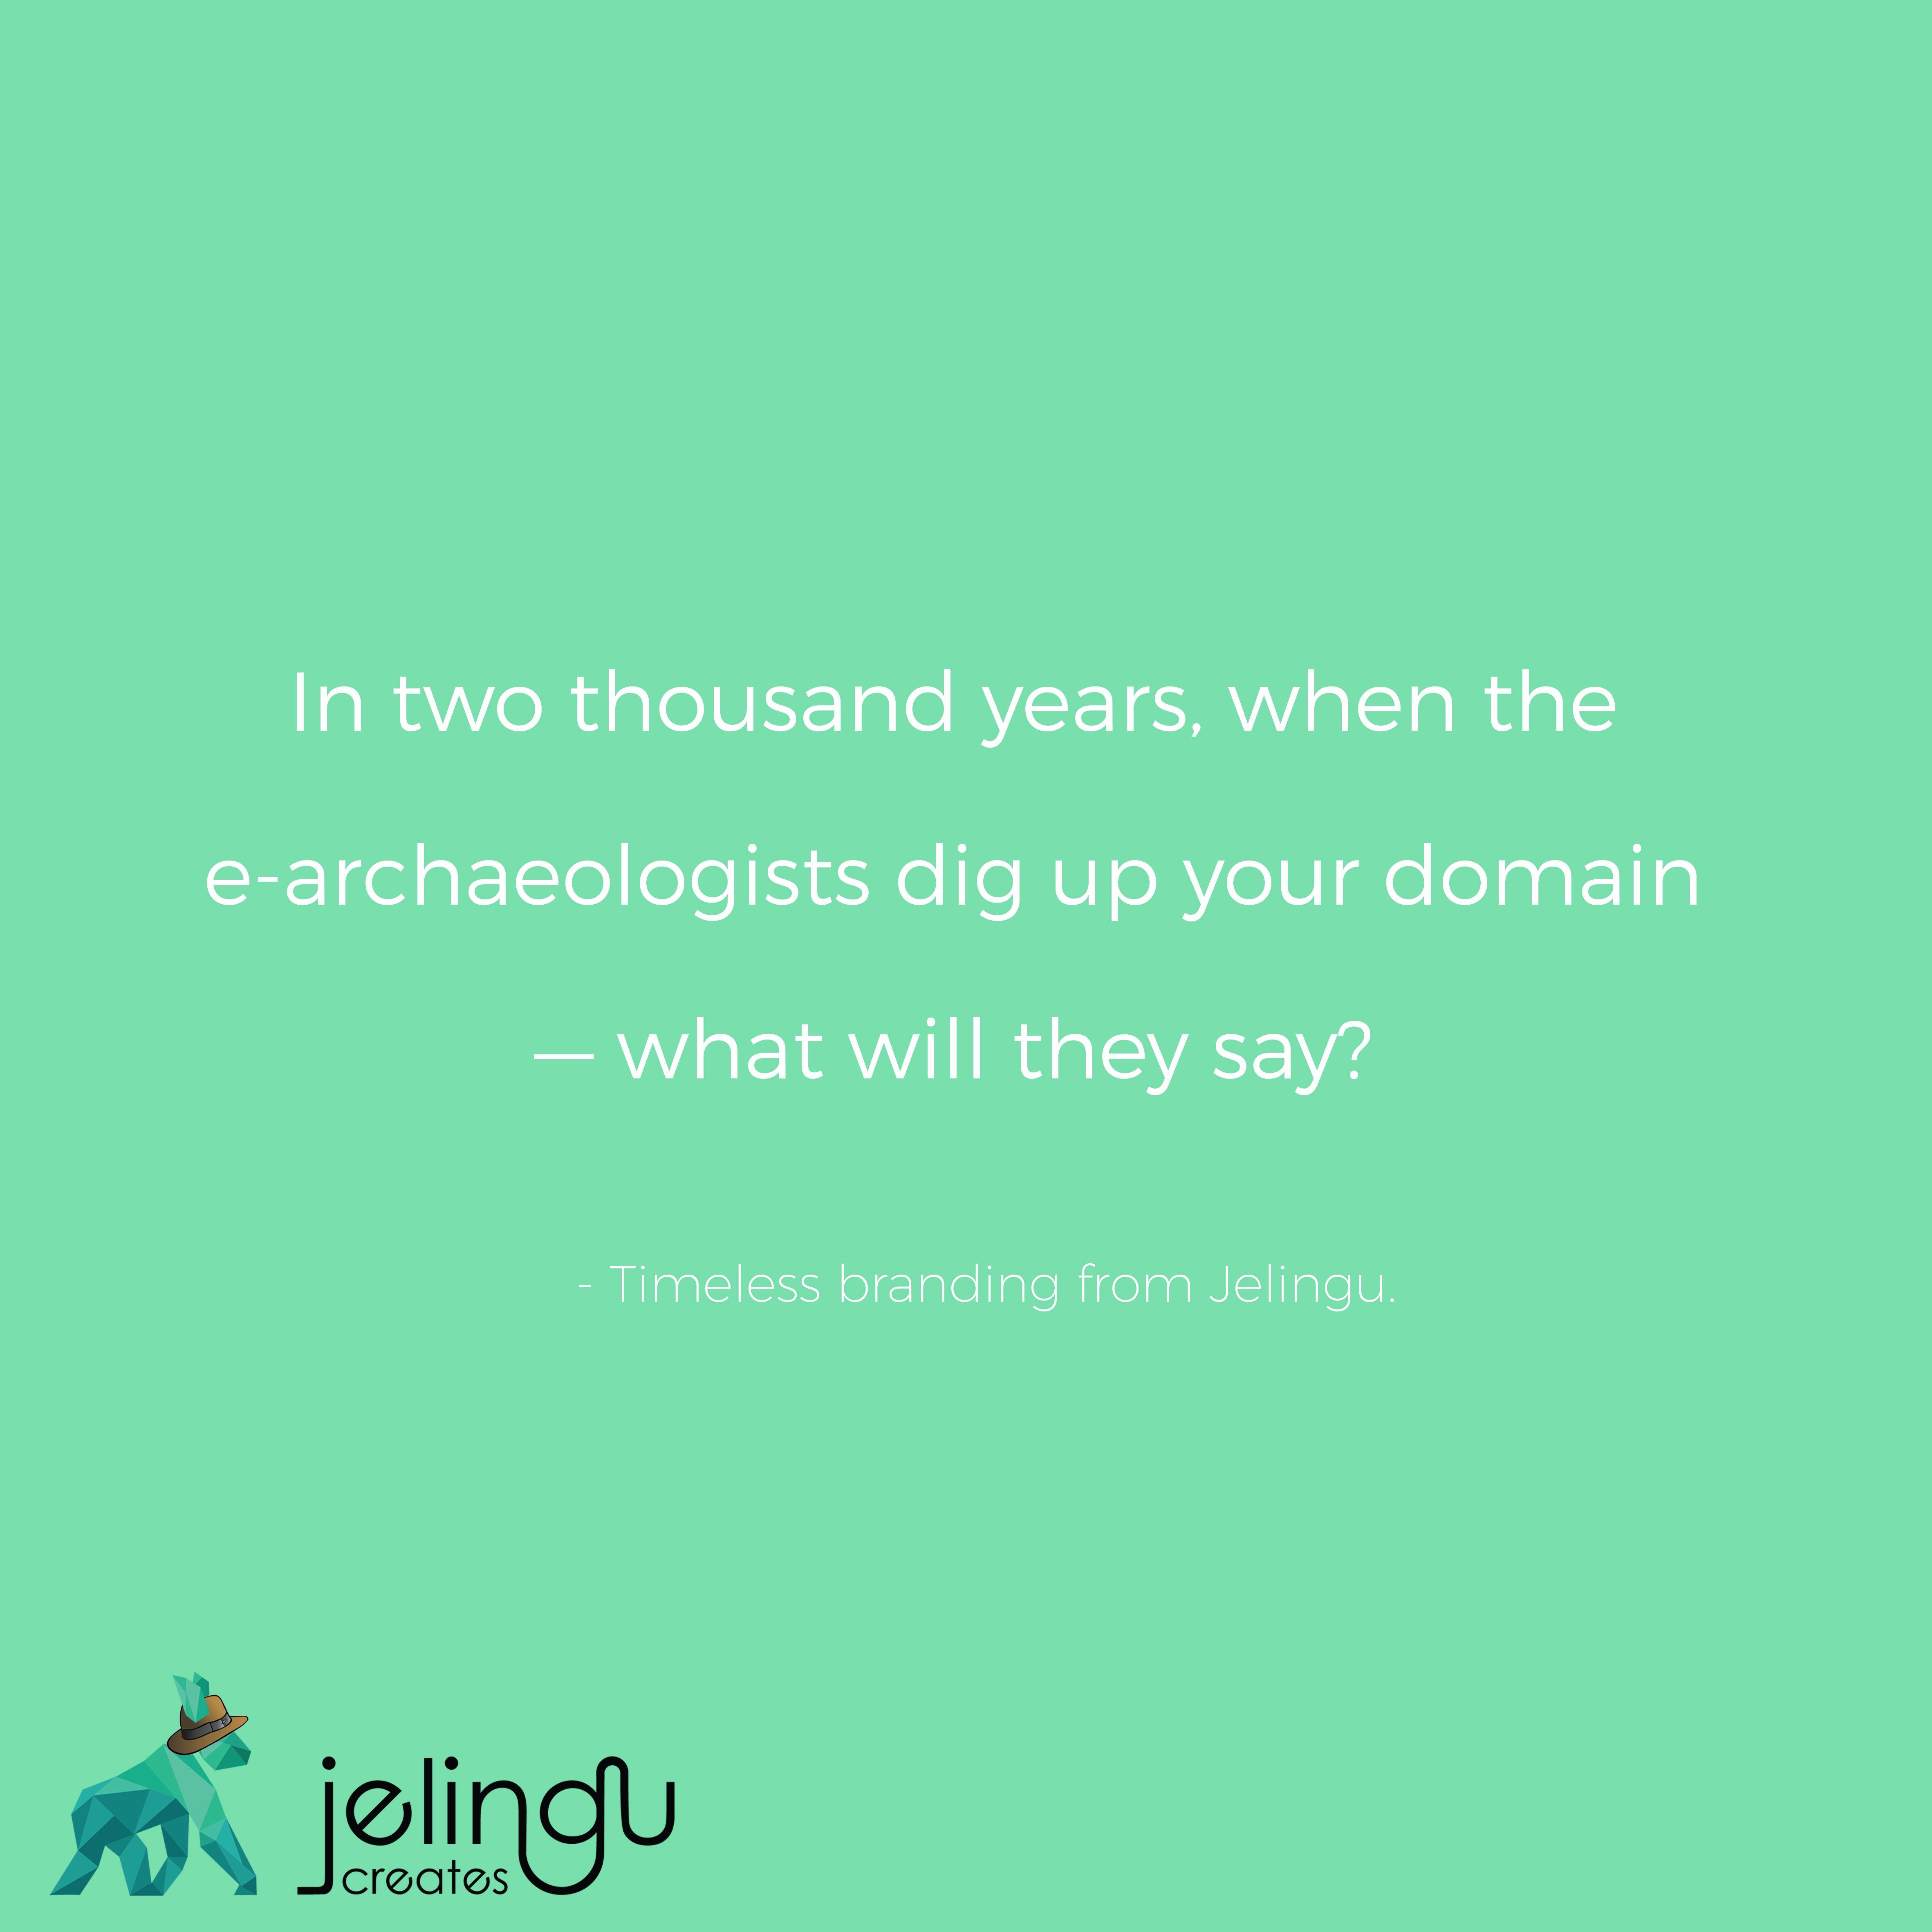 Web Development Quotes Jelingu Jelingucreates Quote Quotes Inspo Inspiration